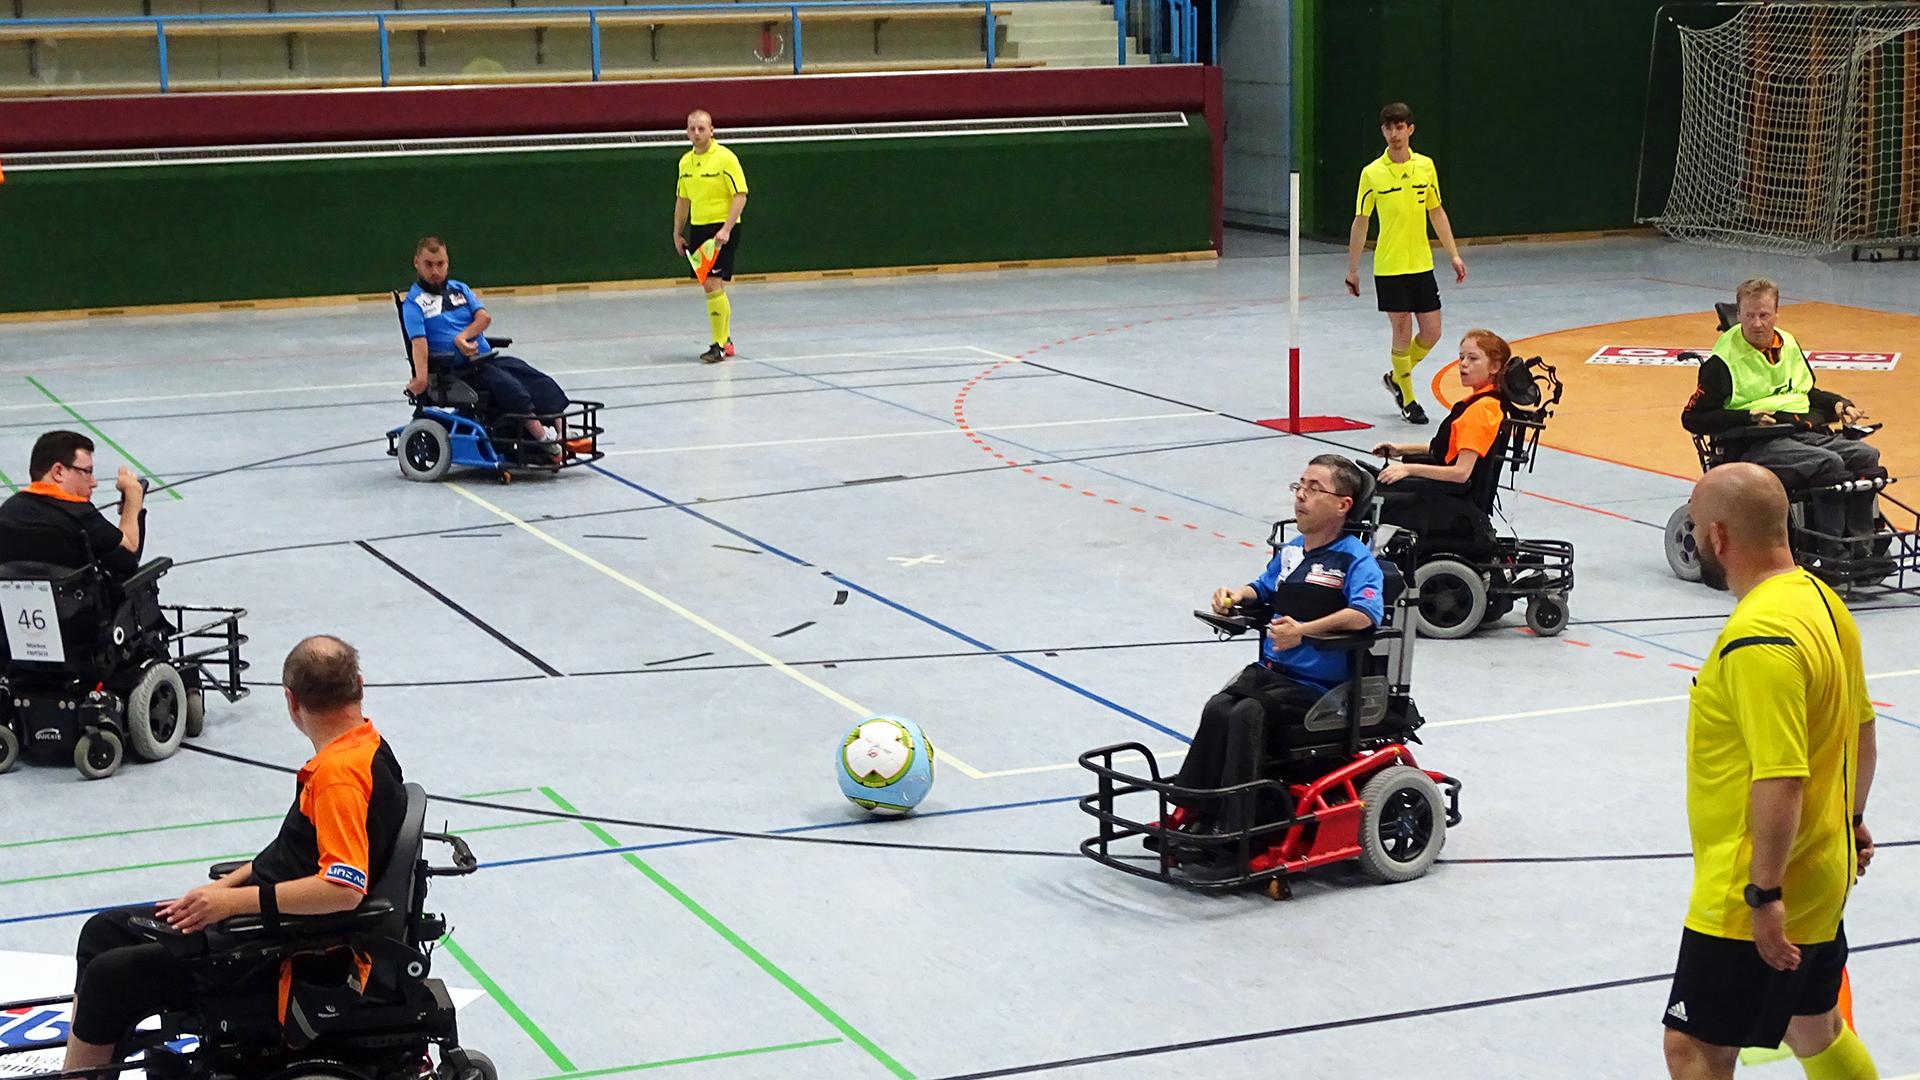 Hinrunde der E-Rolli Fußball Liga 2018: Thunder E-agles gegen Steelchairs Linz 1